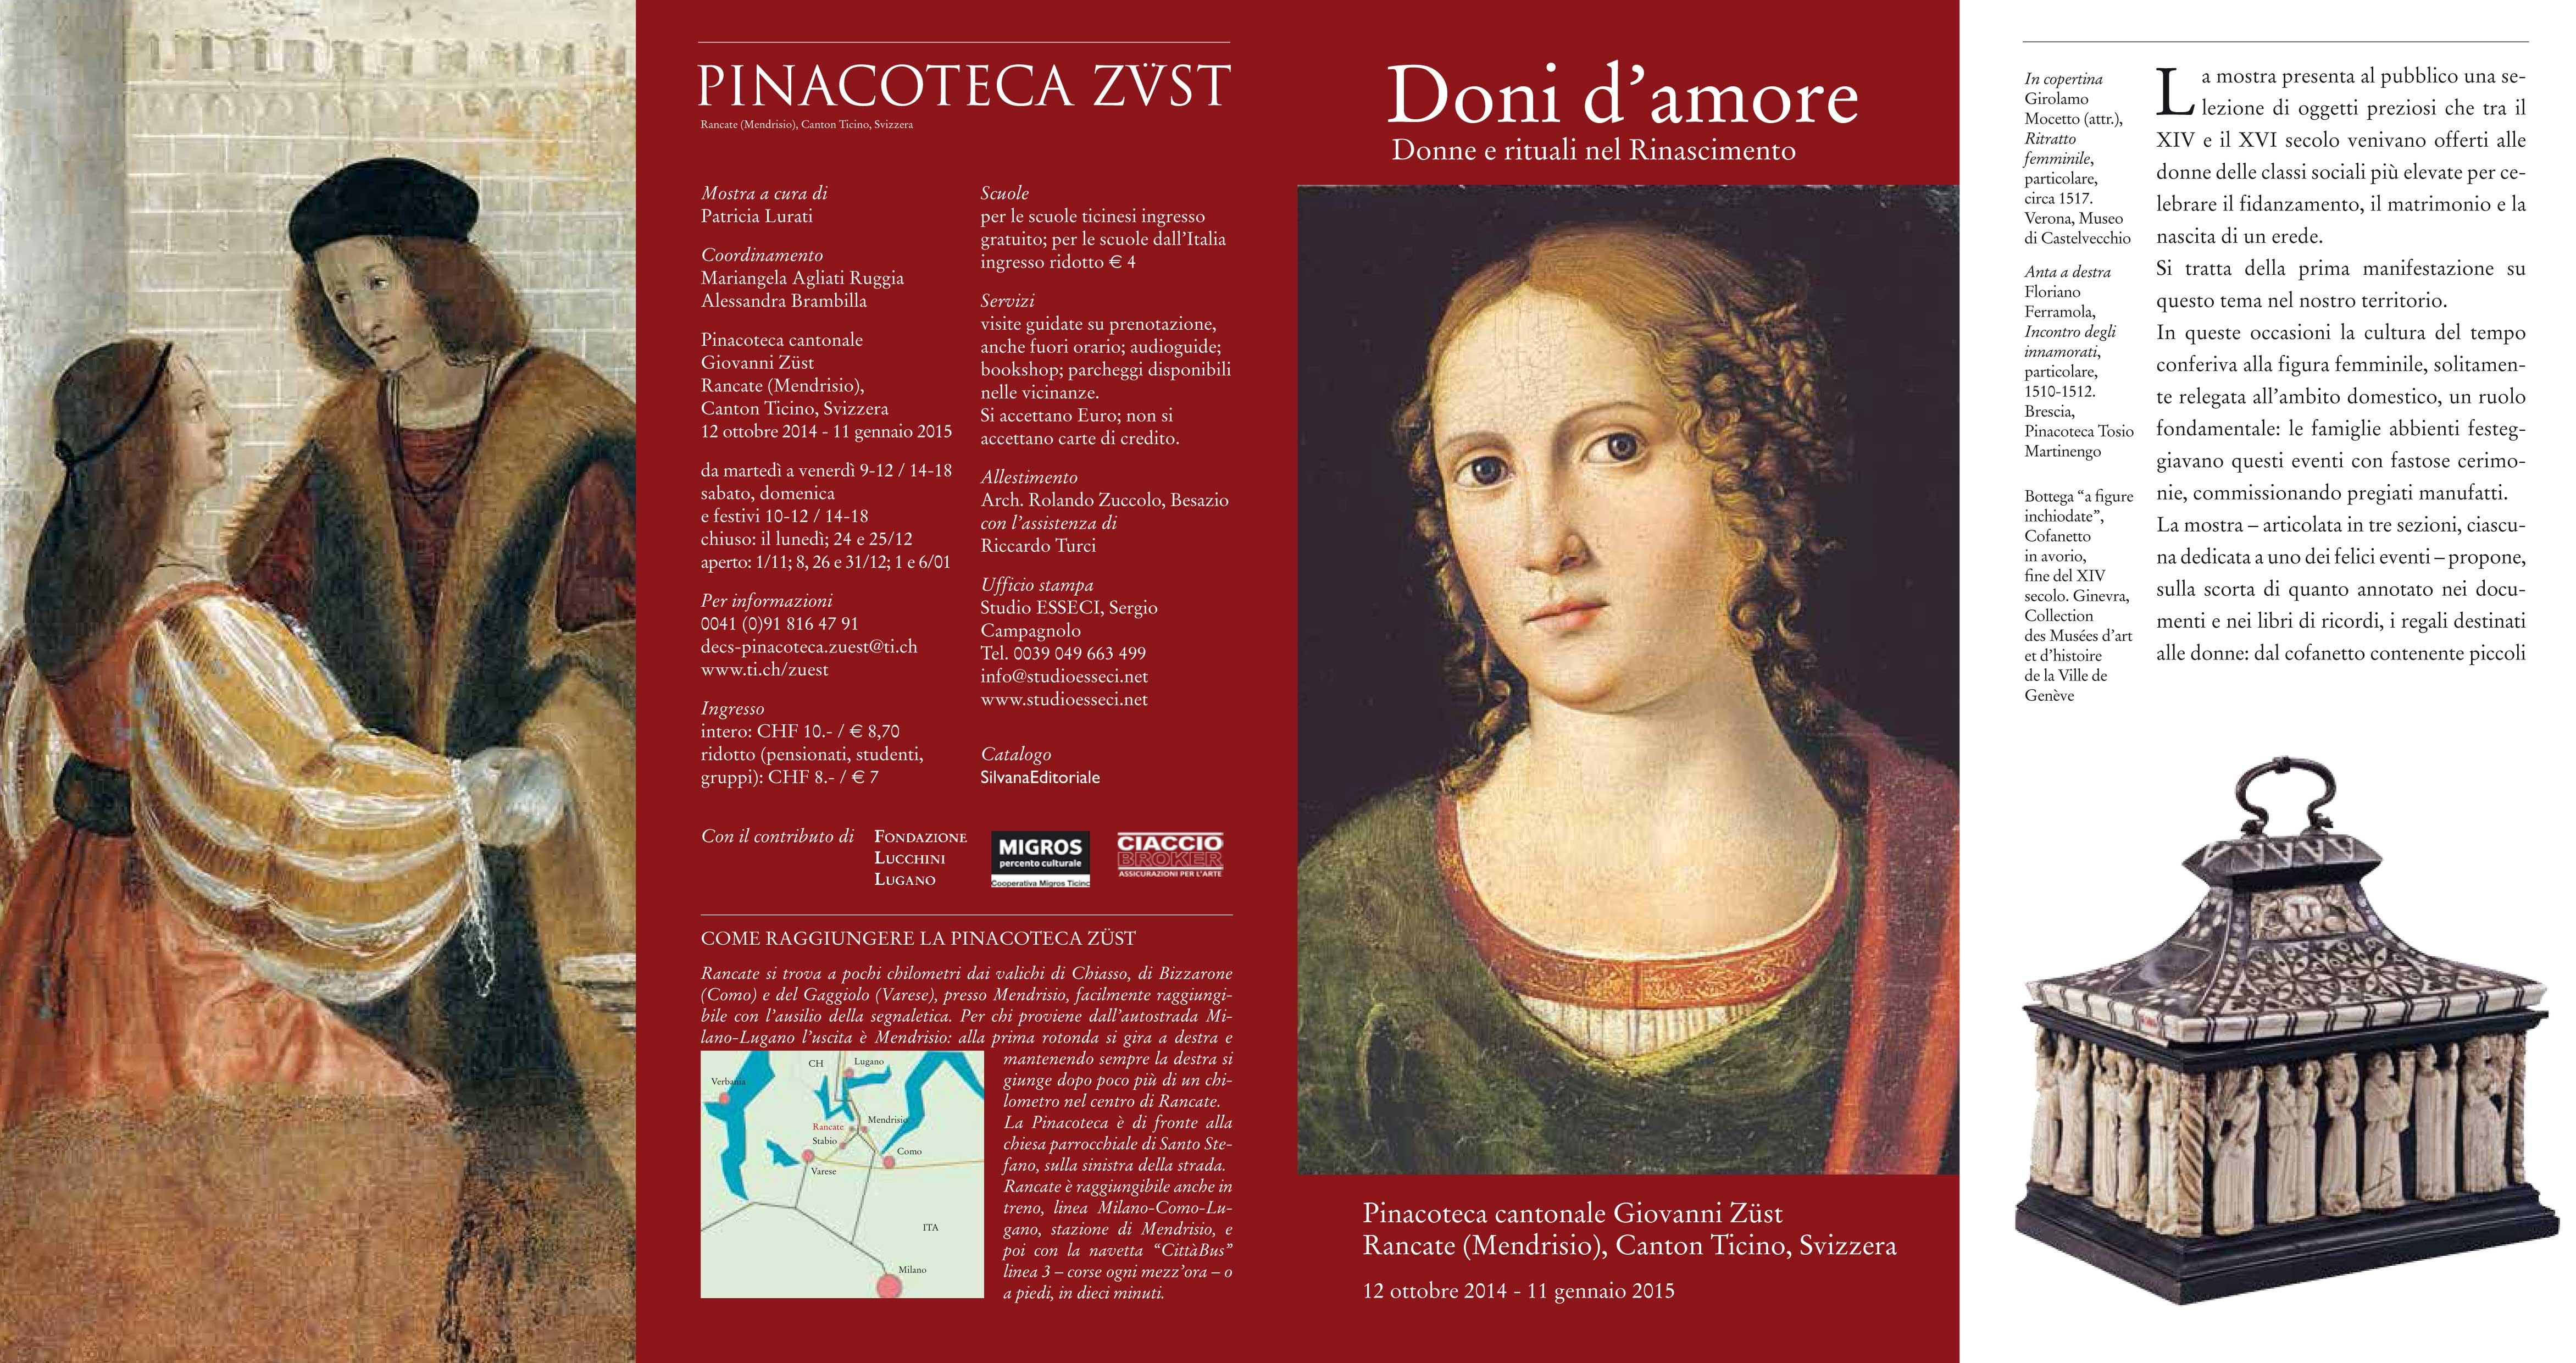 DONI D'AMORE  Pinacoteca Züst 2014